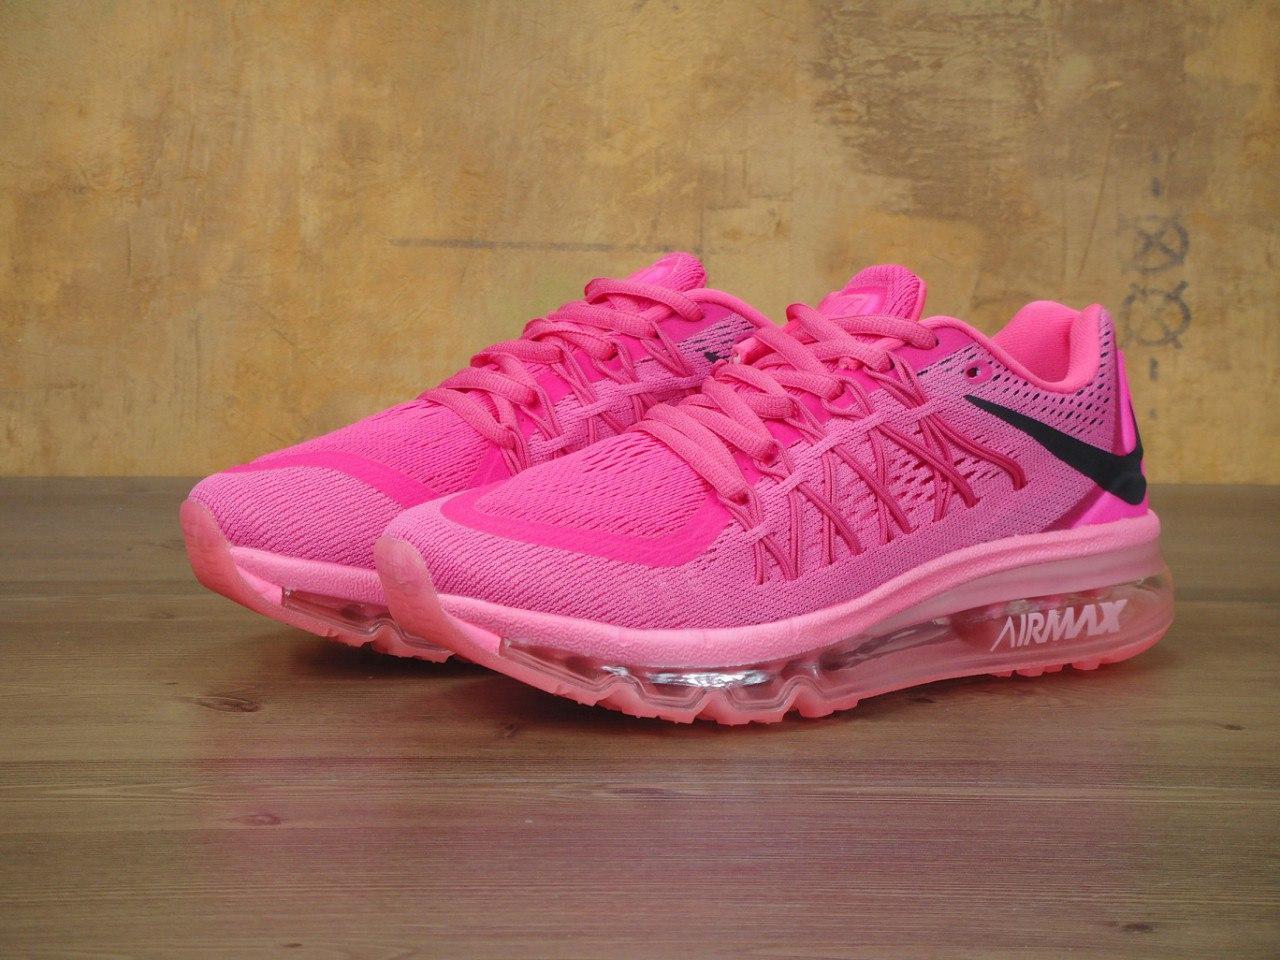 16c6fbb06 Кроссовки женские Найк Nike Air Max 2016 Women Pink Black: 1 260 грн ...